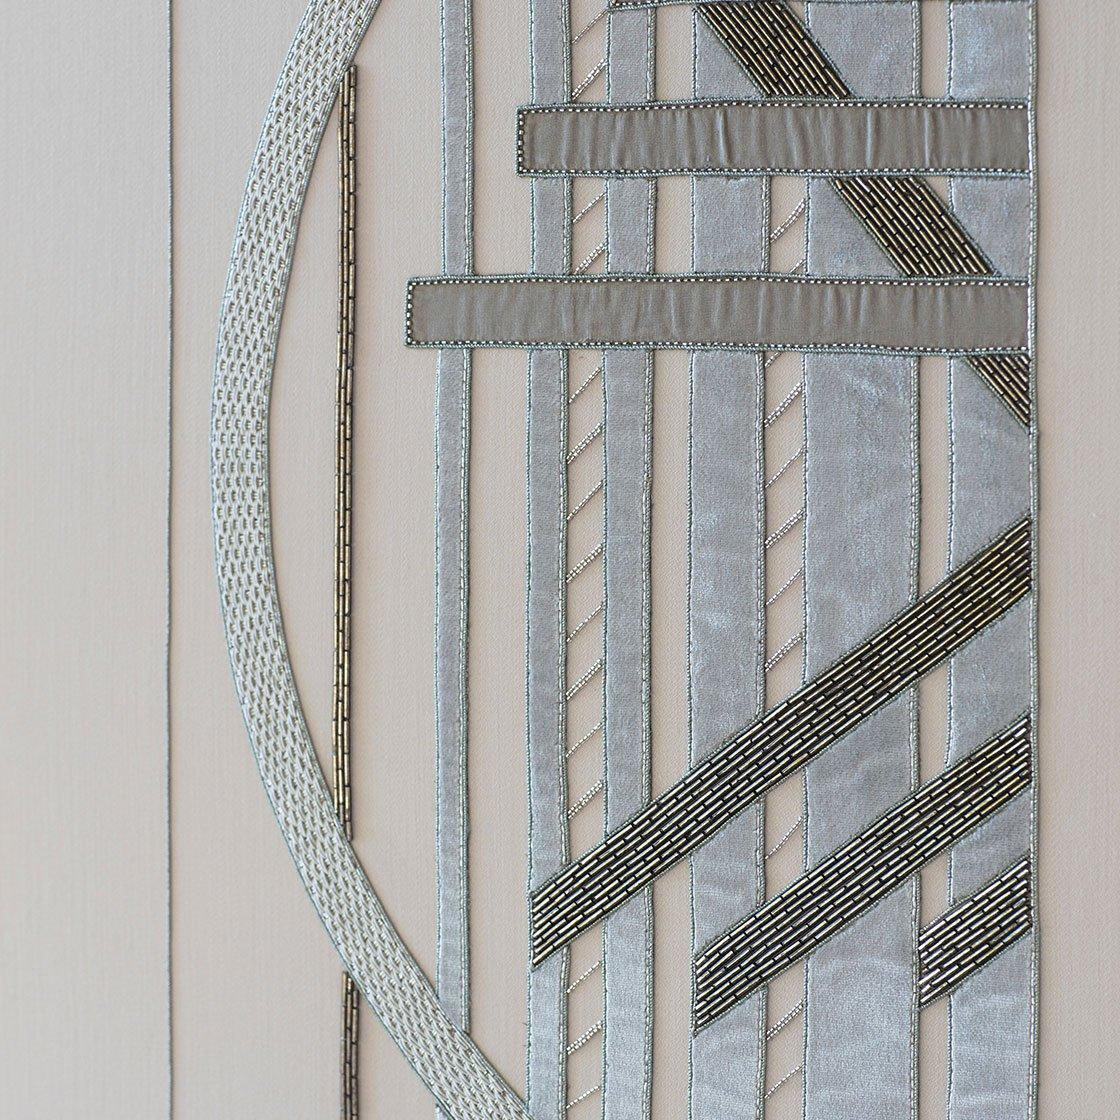 Audrey - Embroidery On Eriskay Wool - Beaumont & Fletcher - Beaumont & Fletcher